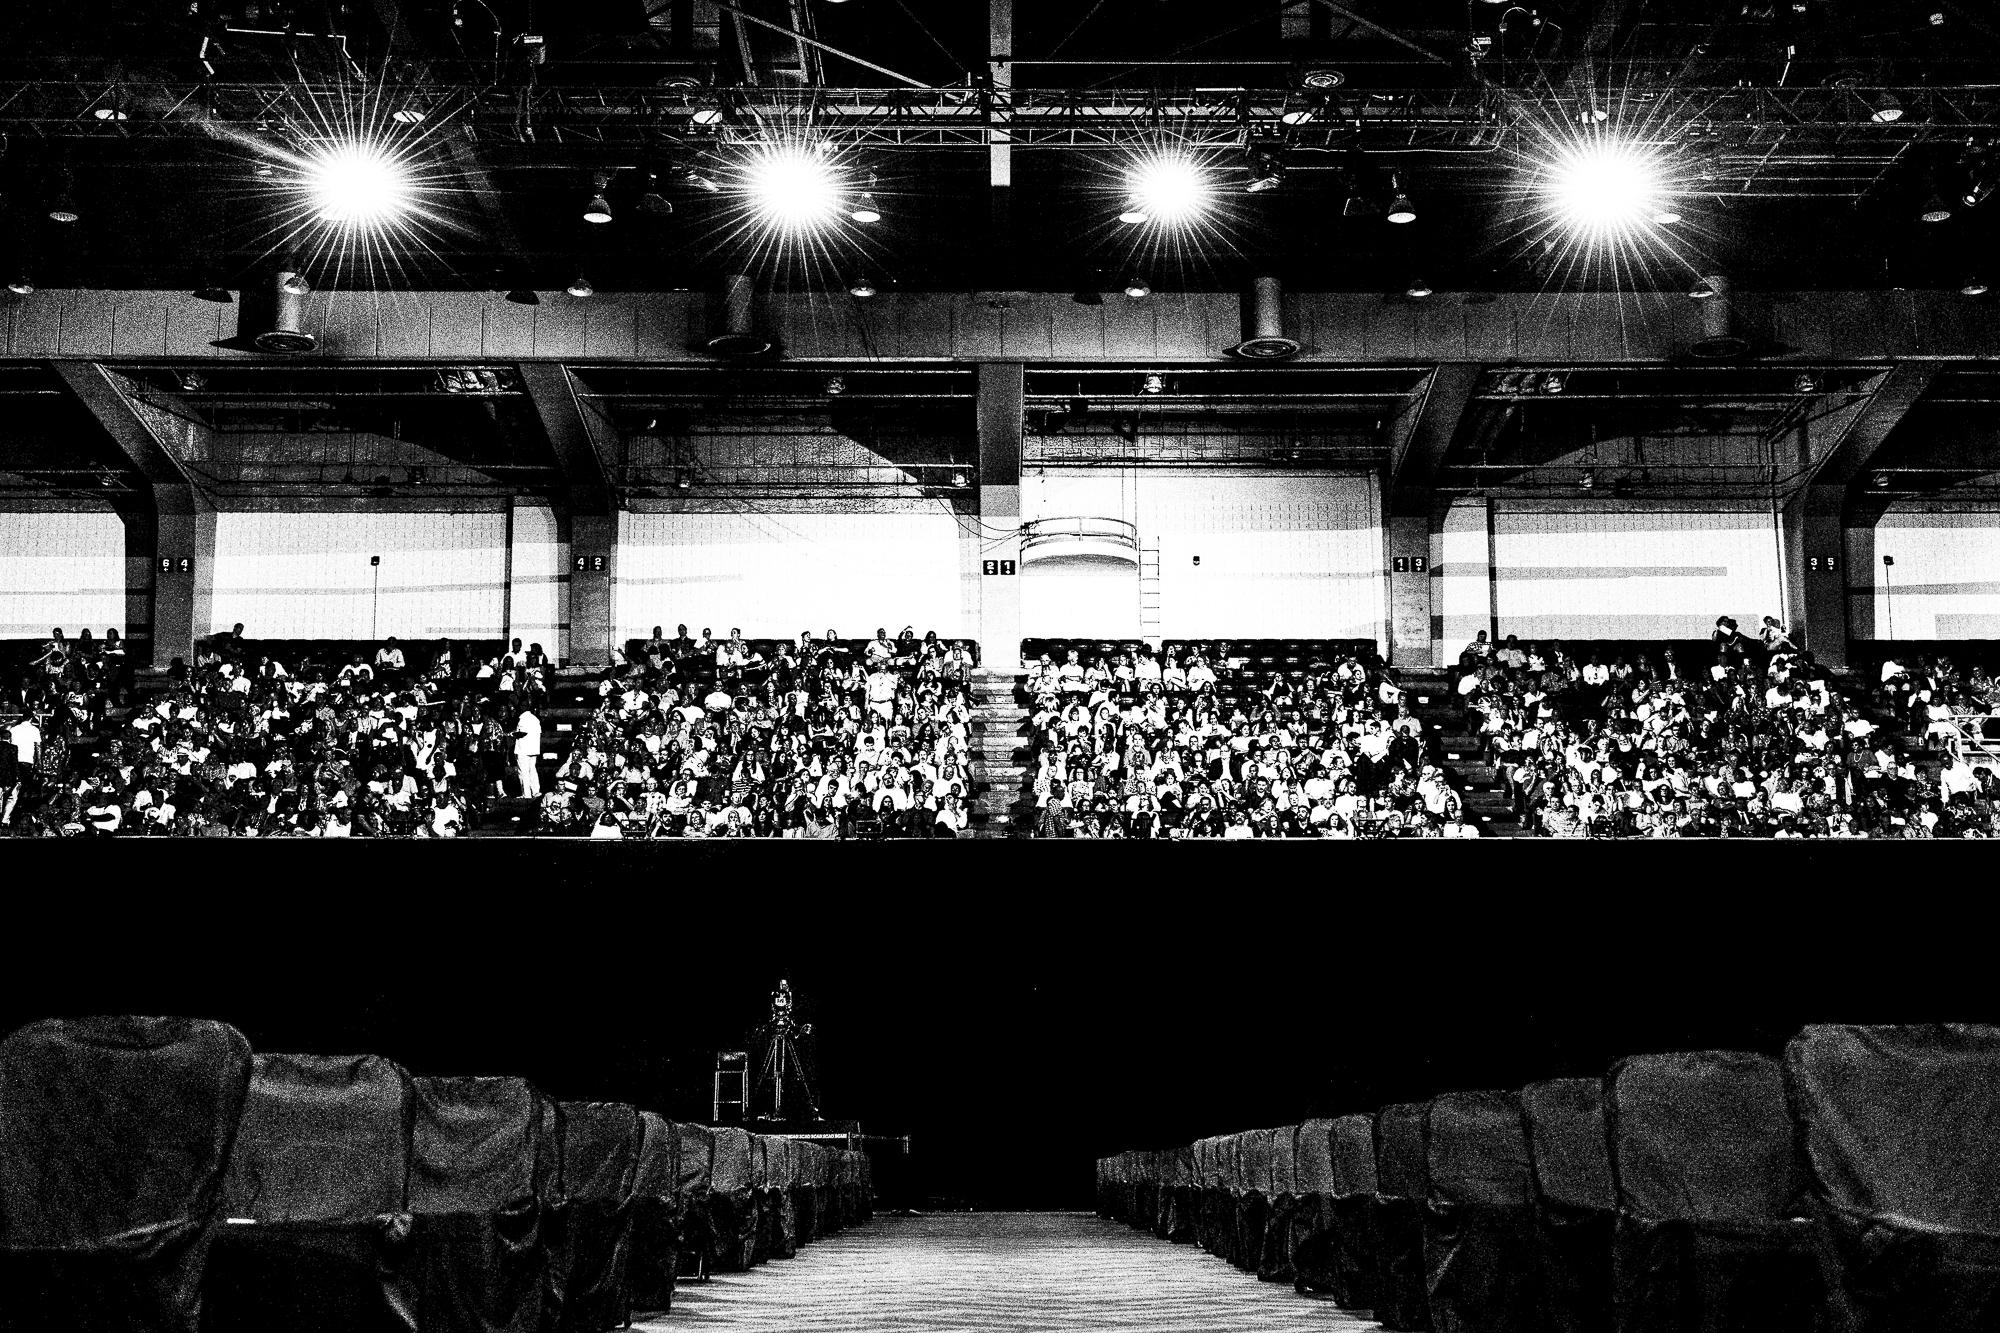 A Convention Center in Savannah, USA.